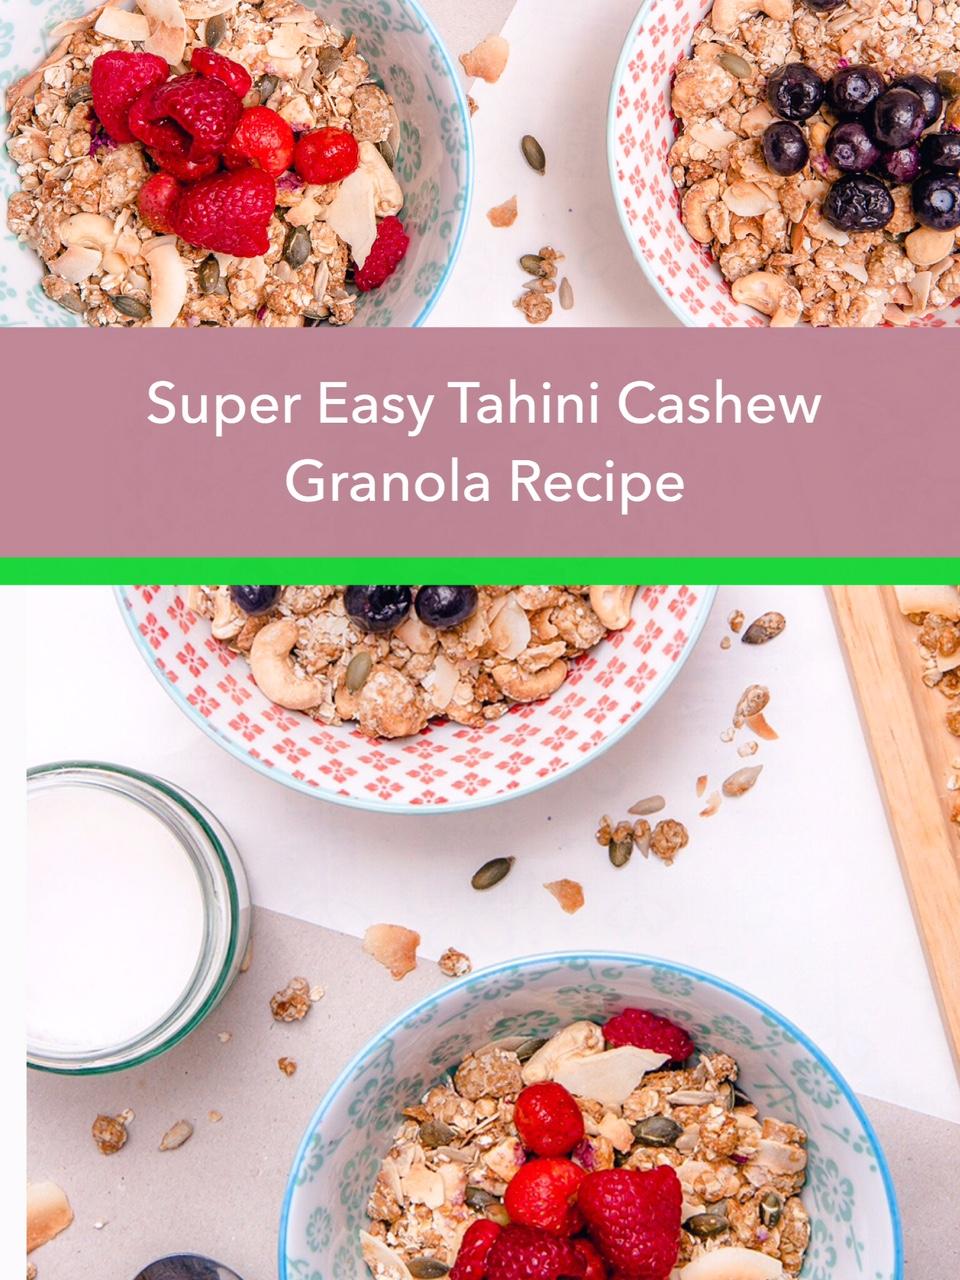 super easy tahini cashew granola recipe